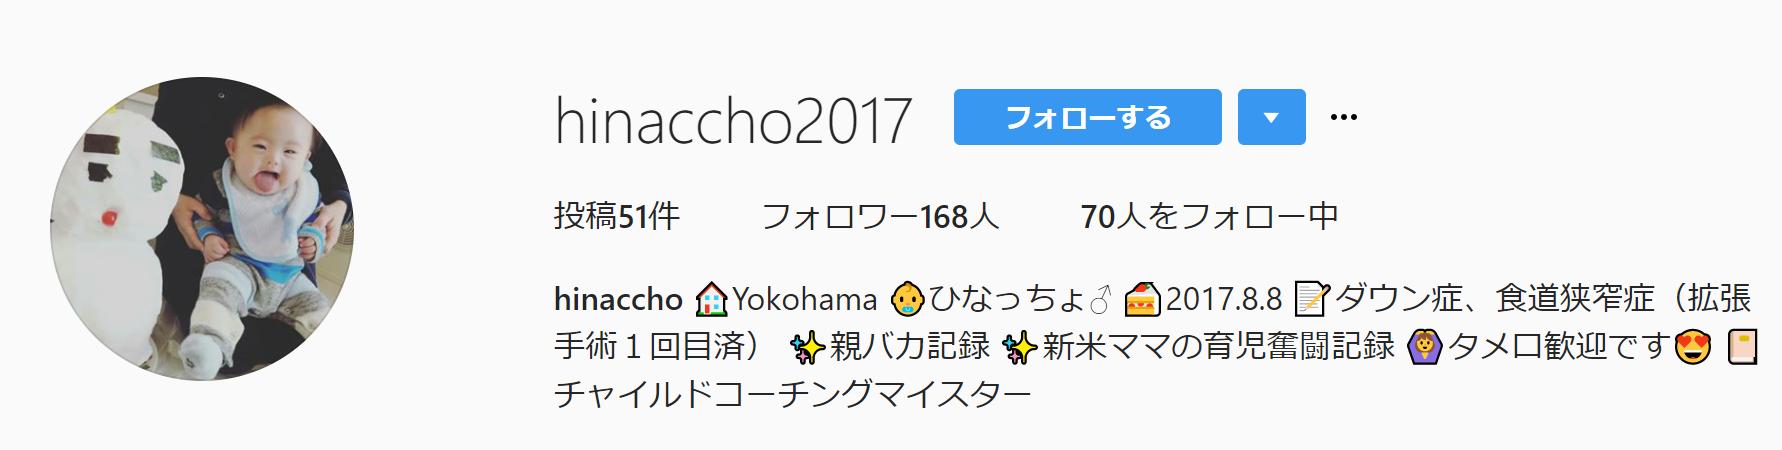 https://www.instagram.com/hinaccho2017/